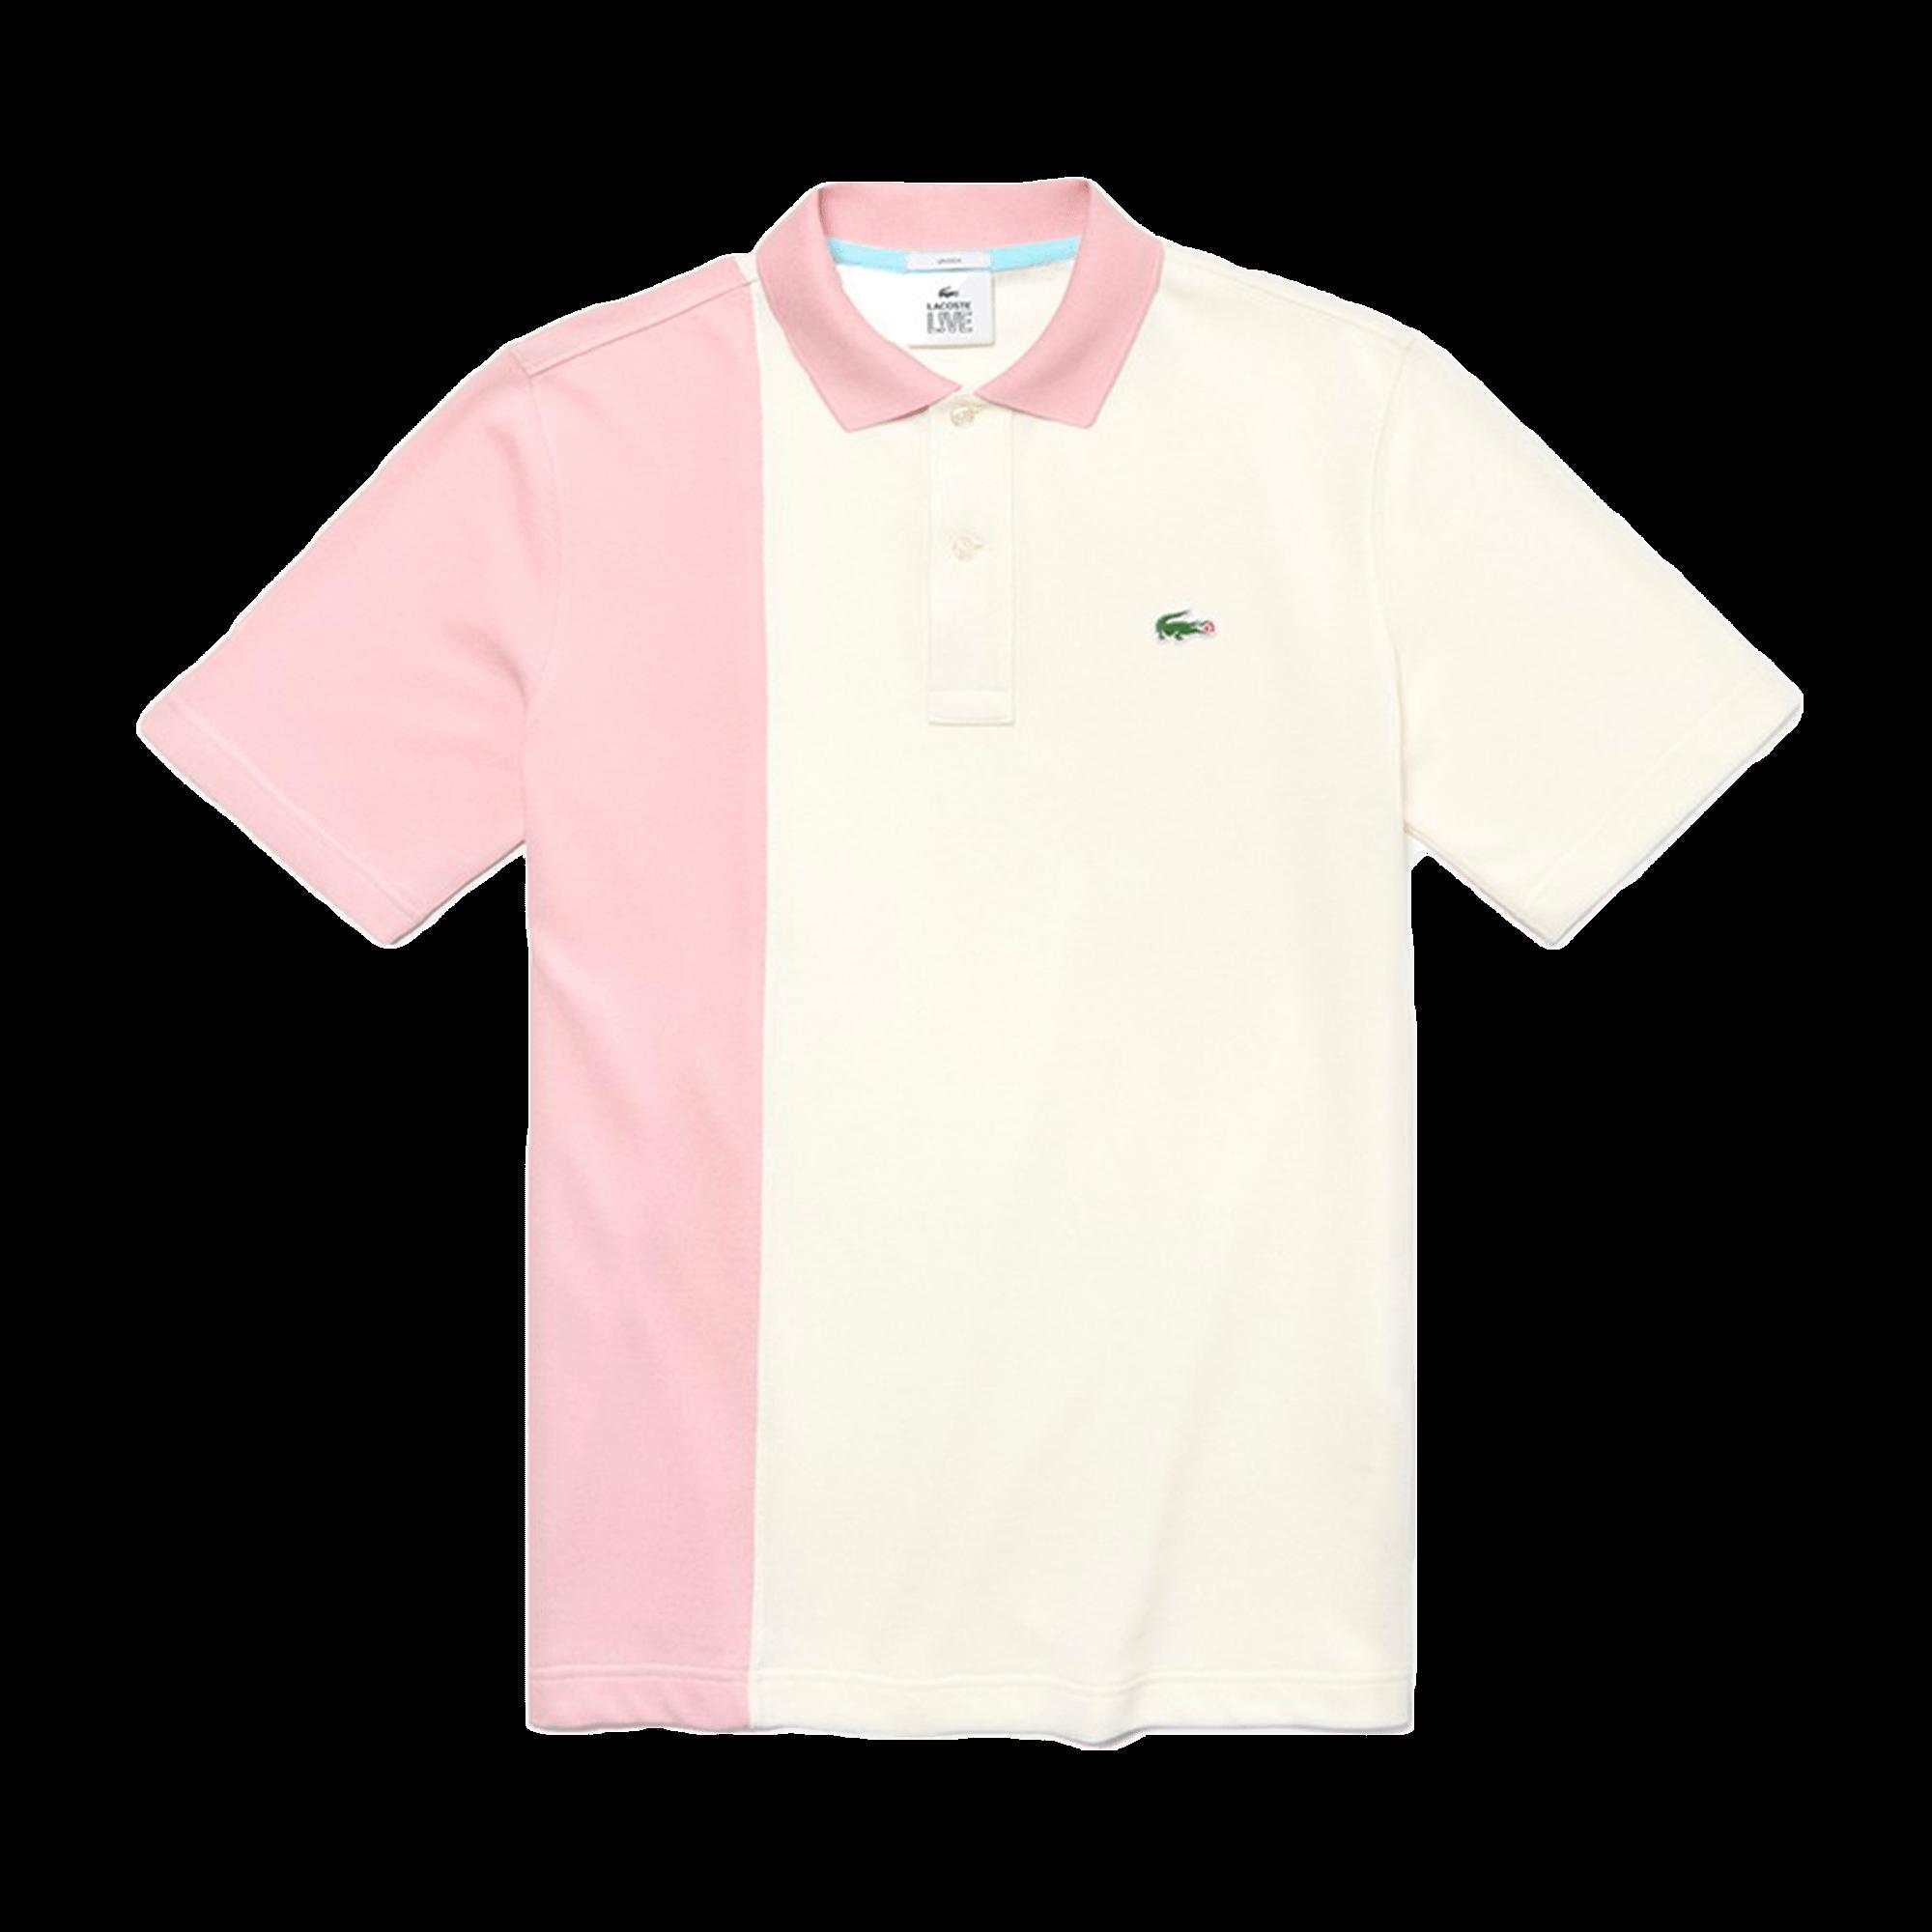 best loved 4d8ee a6297 Lacoste Golf Le Fleur x Lacoste Polo Shirt white / pink - T-shirt |  Holypopstore.com